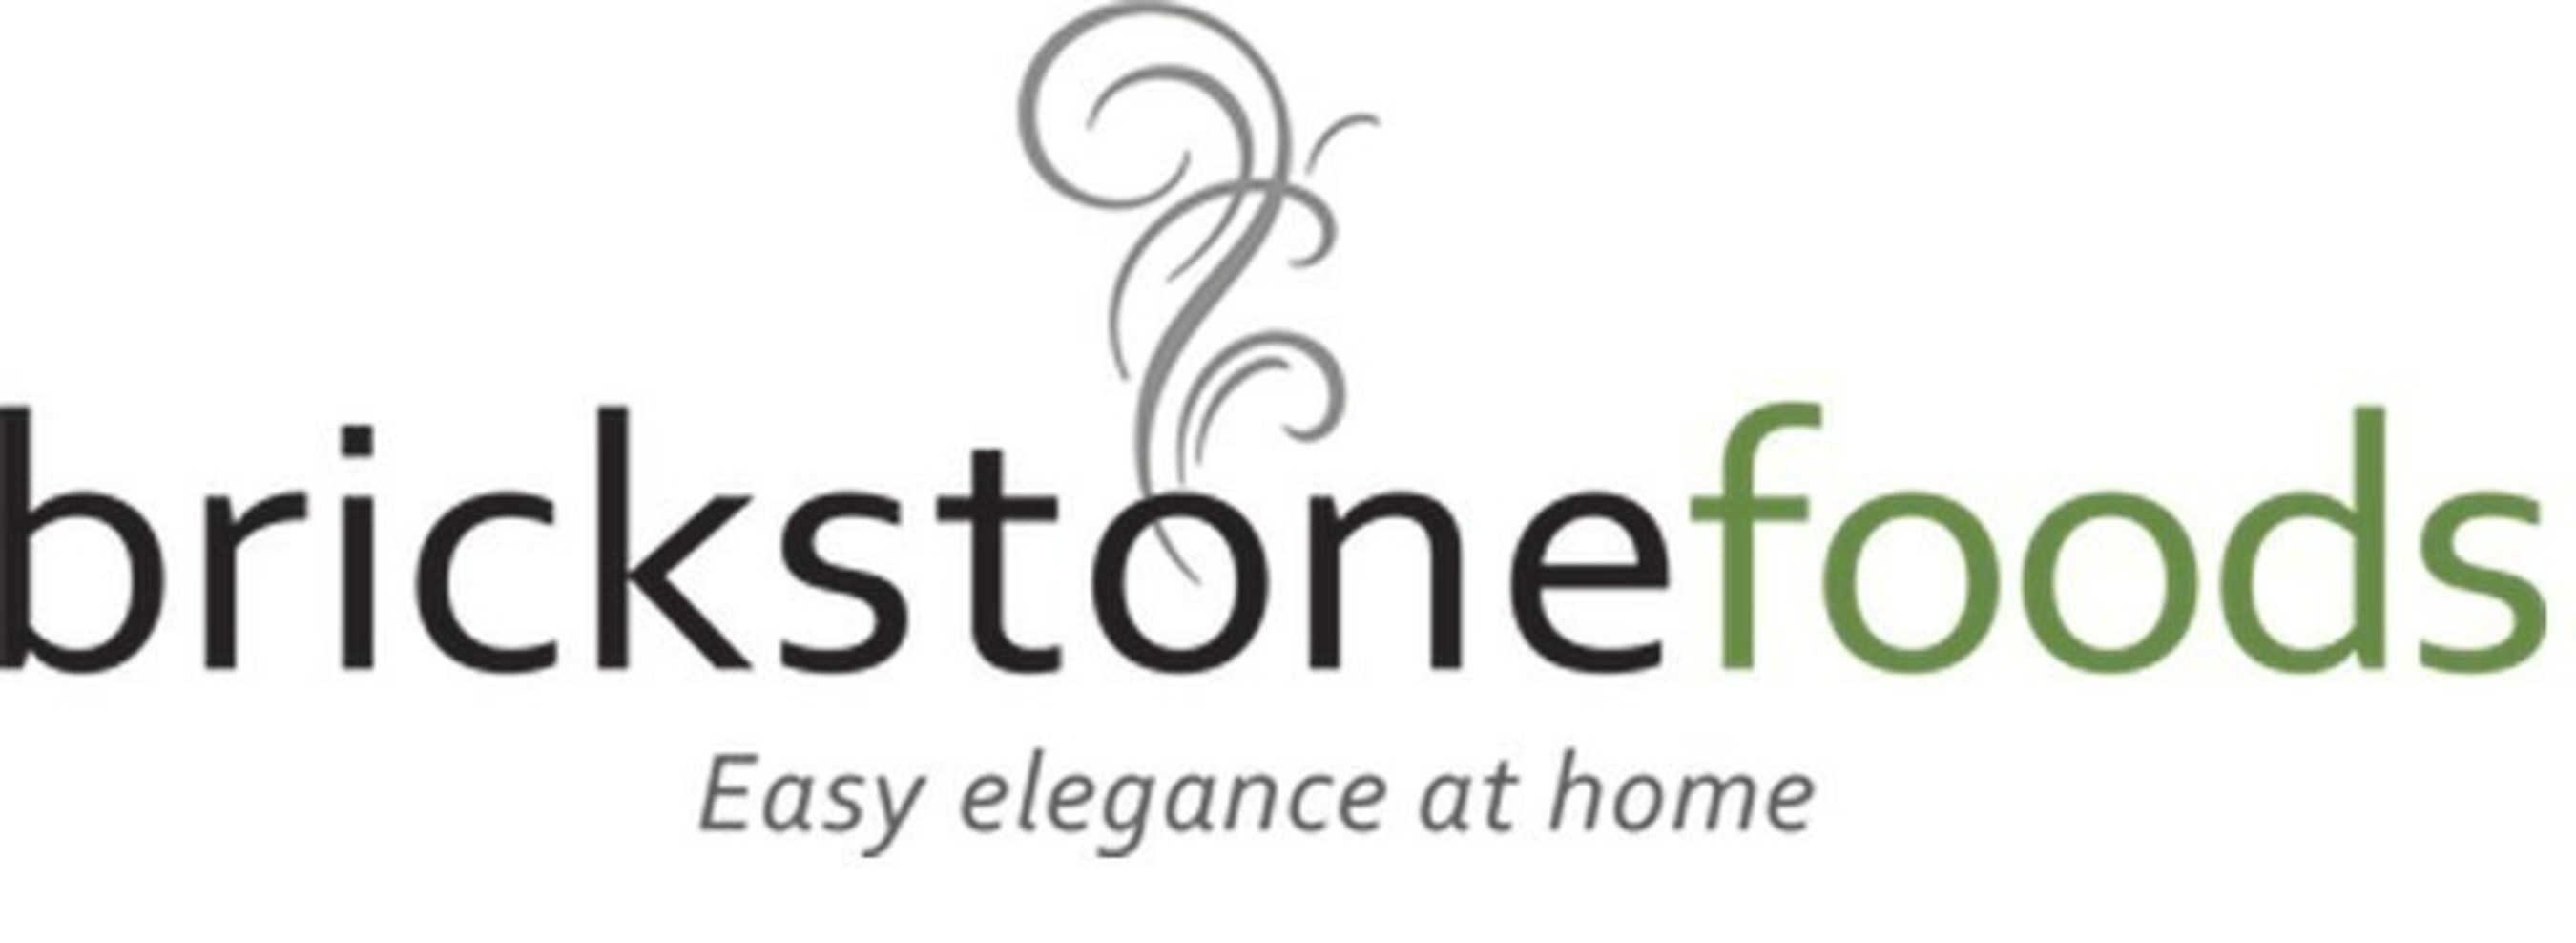 Gourmet Food Online Retailer, Brickstone Foods, Launches